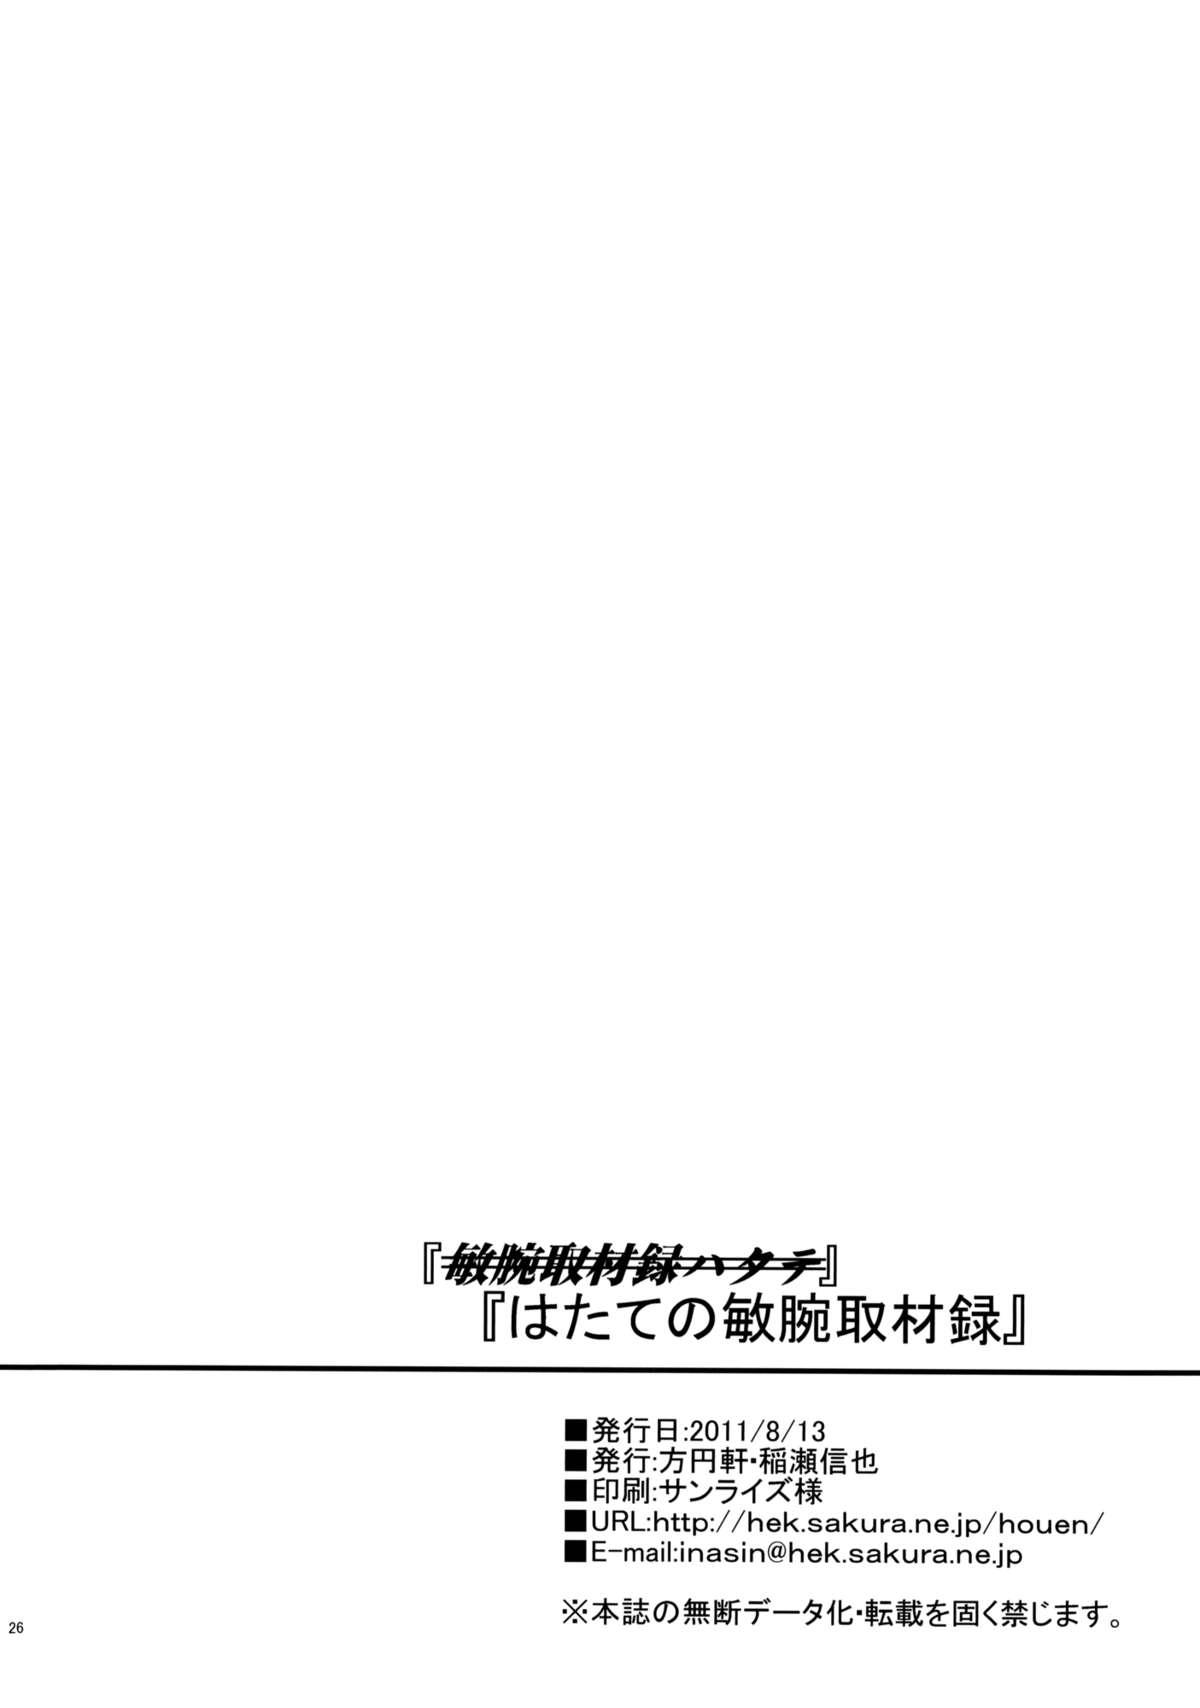 Hatate no Binwan Shuzairoku | Record of Hatate's Competent Fact-Finding 24